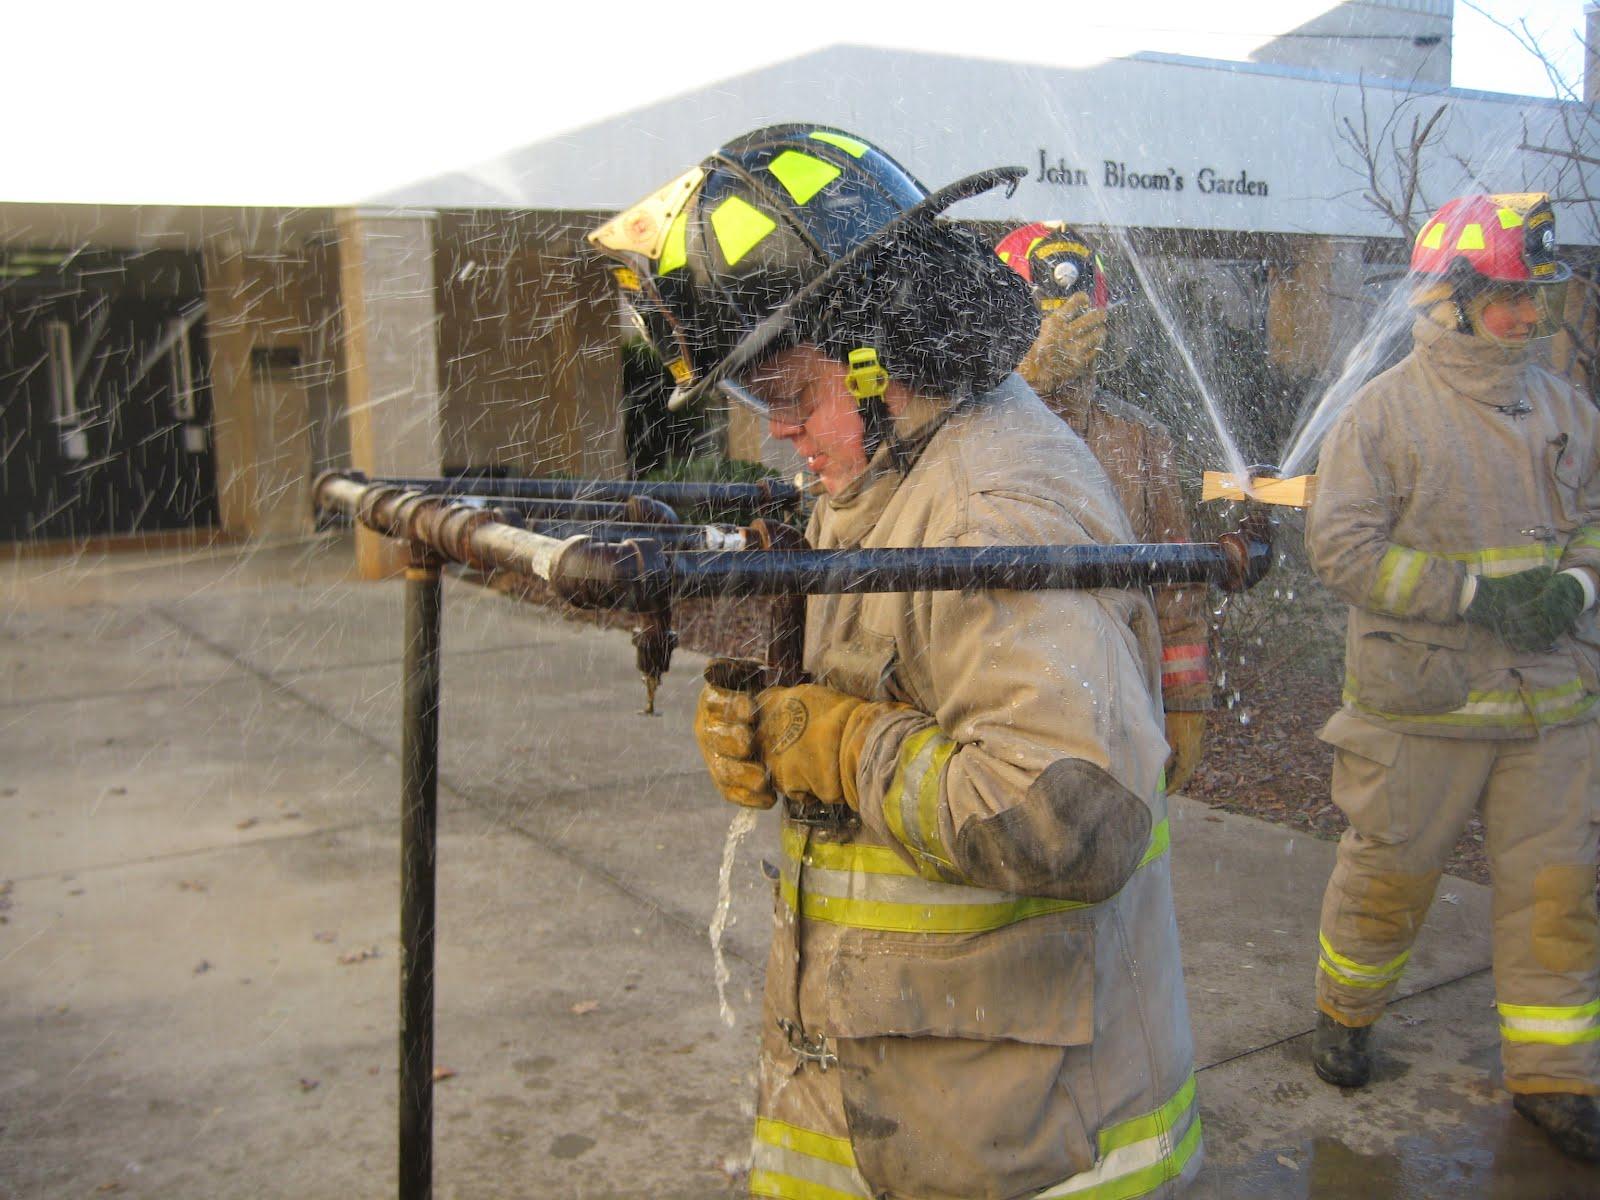 Concord High School Fire Academy Sprinkler Fun In 20